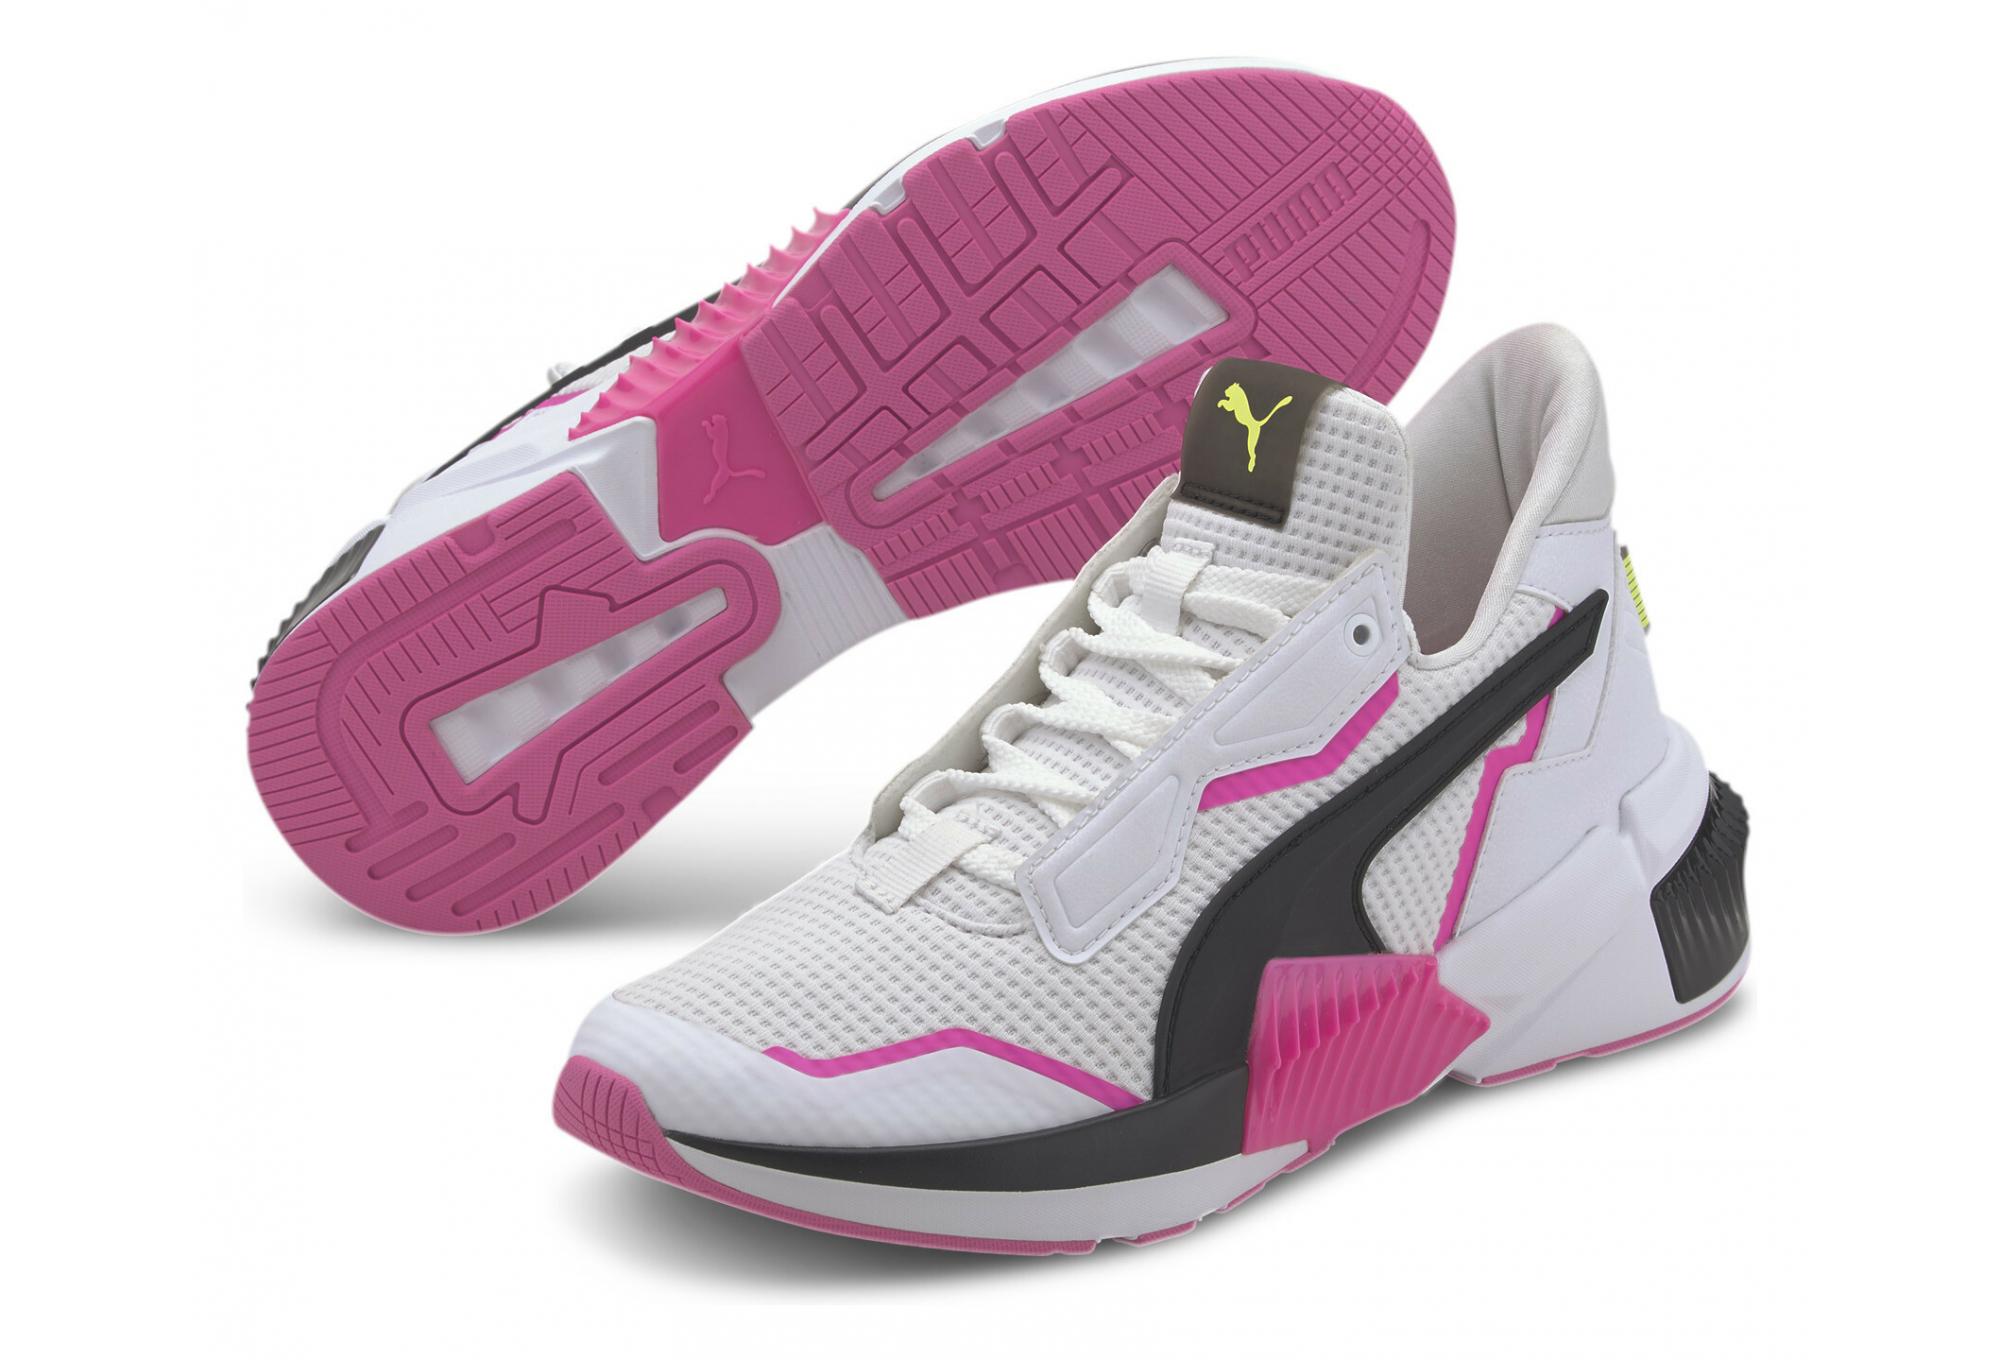 Chaussures femme Puma Provoke XT Wn's | Alltricks.com